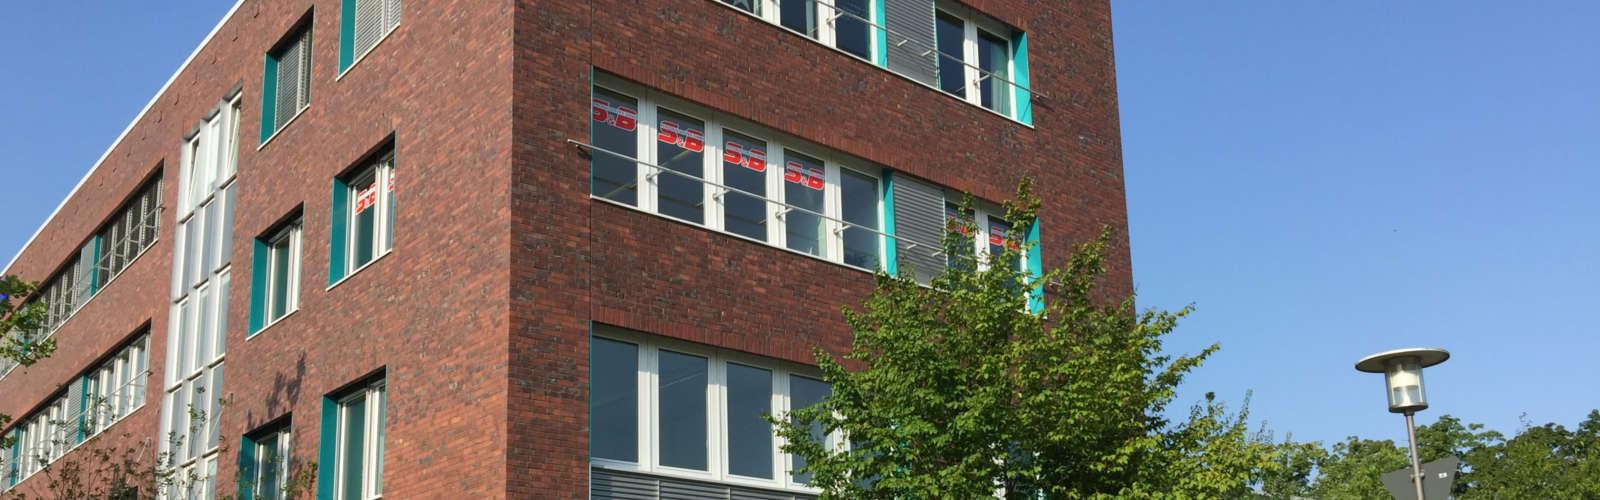 Firmengebäude der S&B Personalservice GmbH in Potsdam